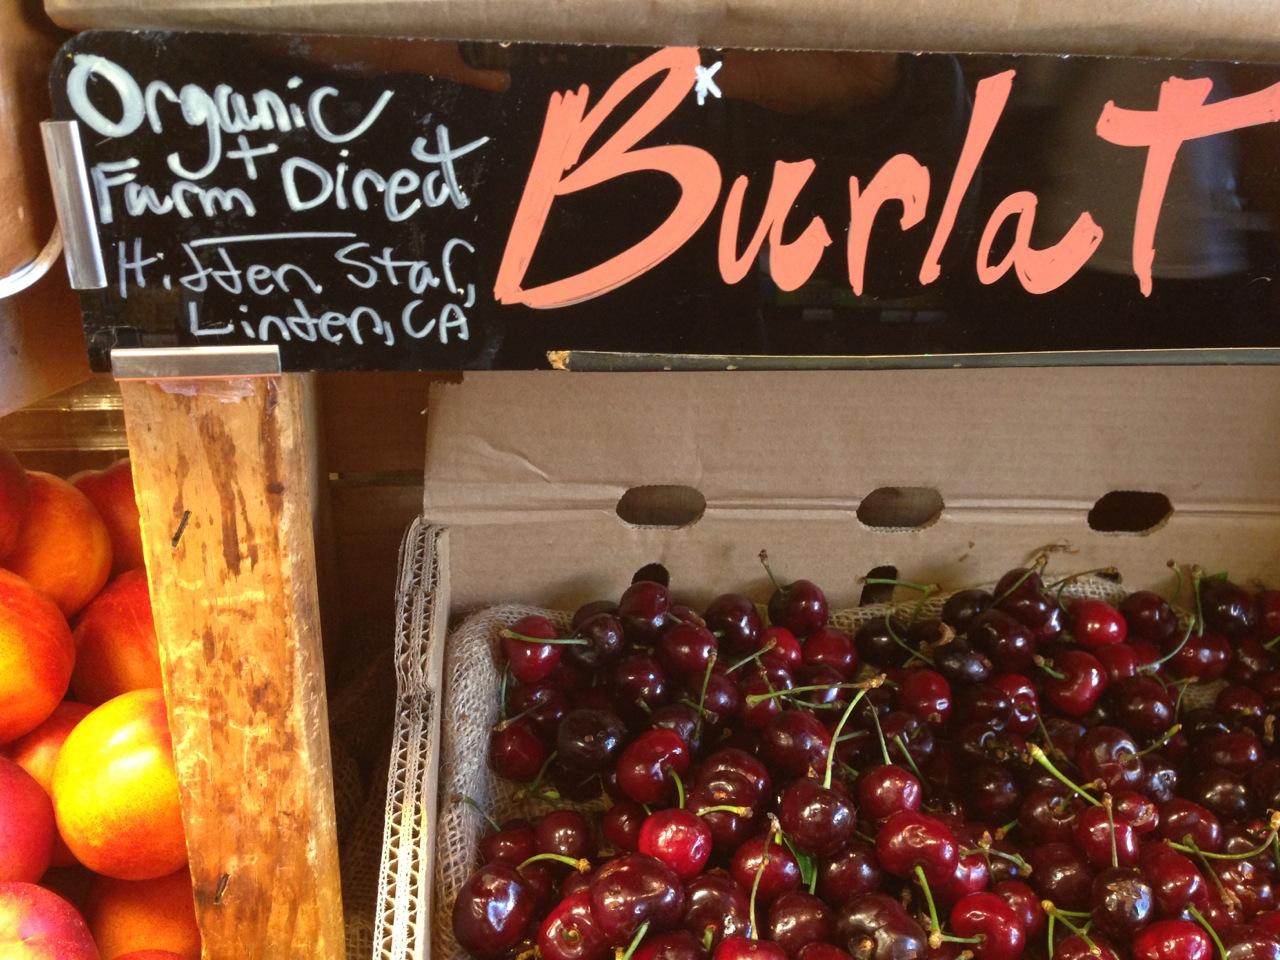 Light California Cherry Season Thanks to Warm Winter - Expect Higher Prices